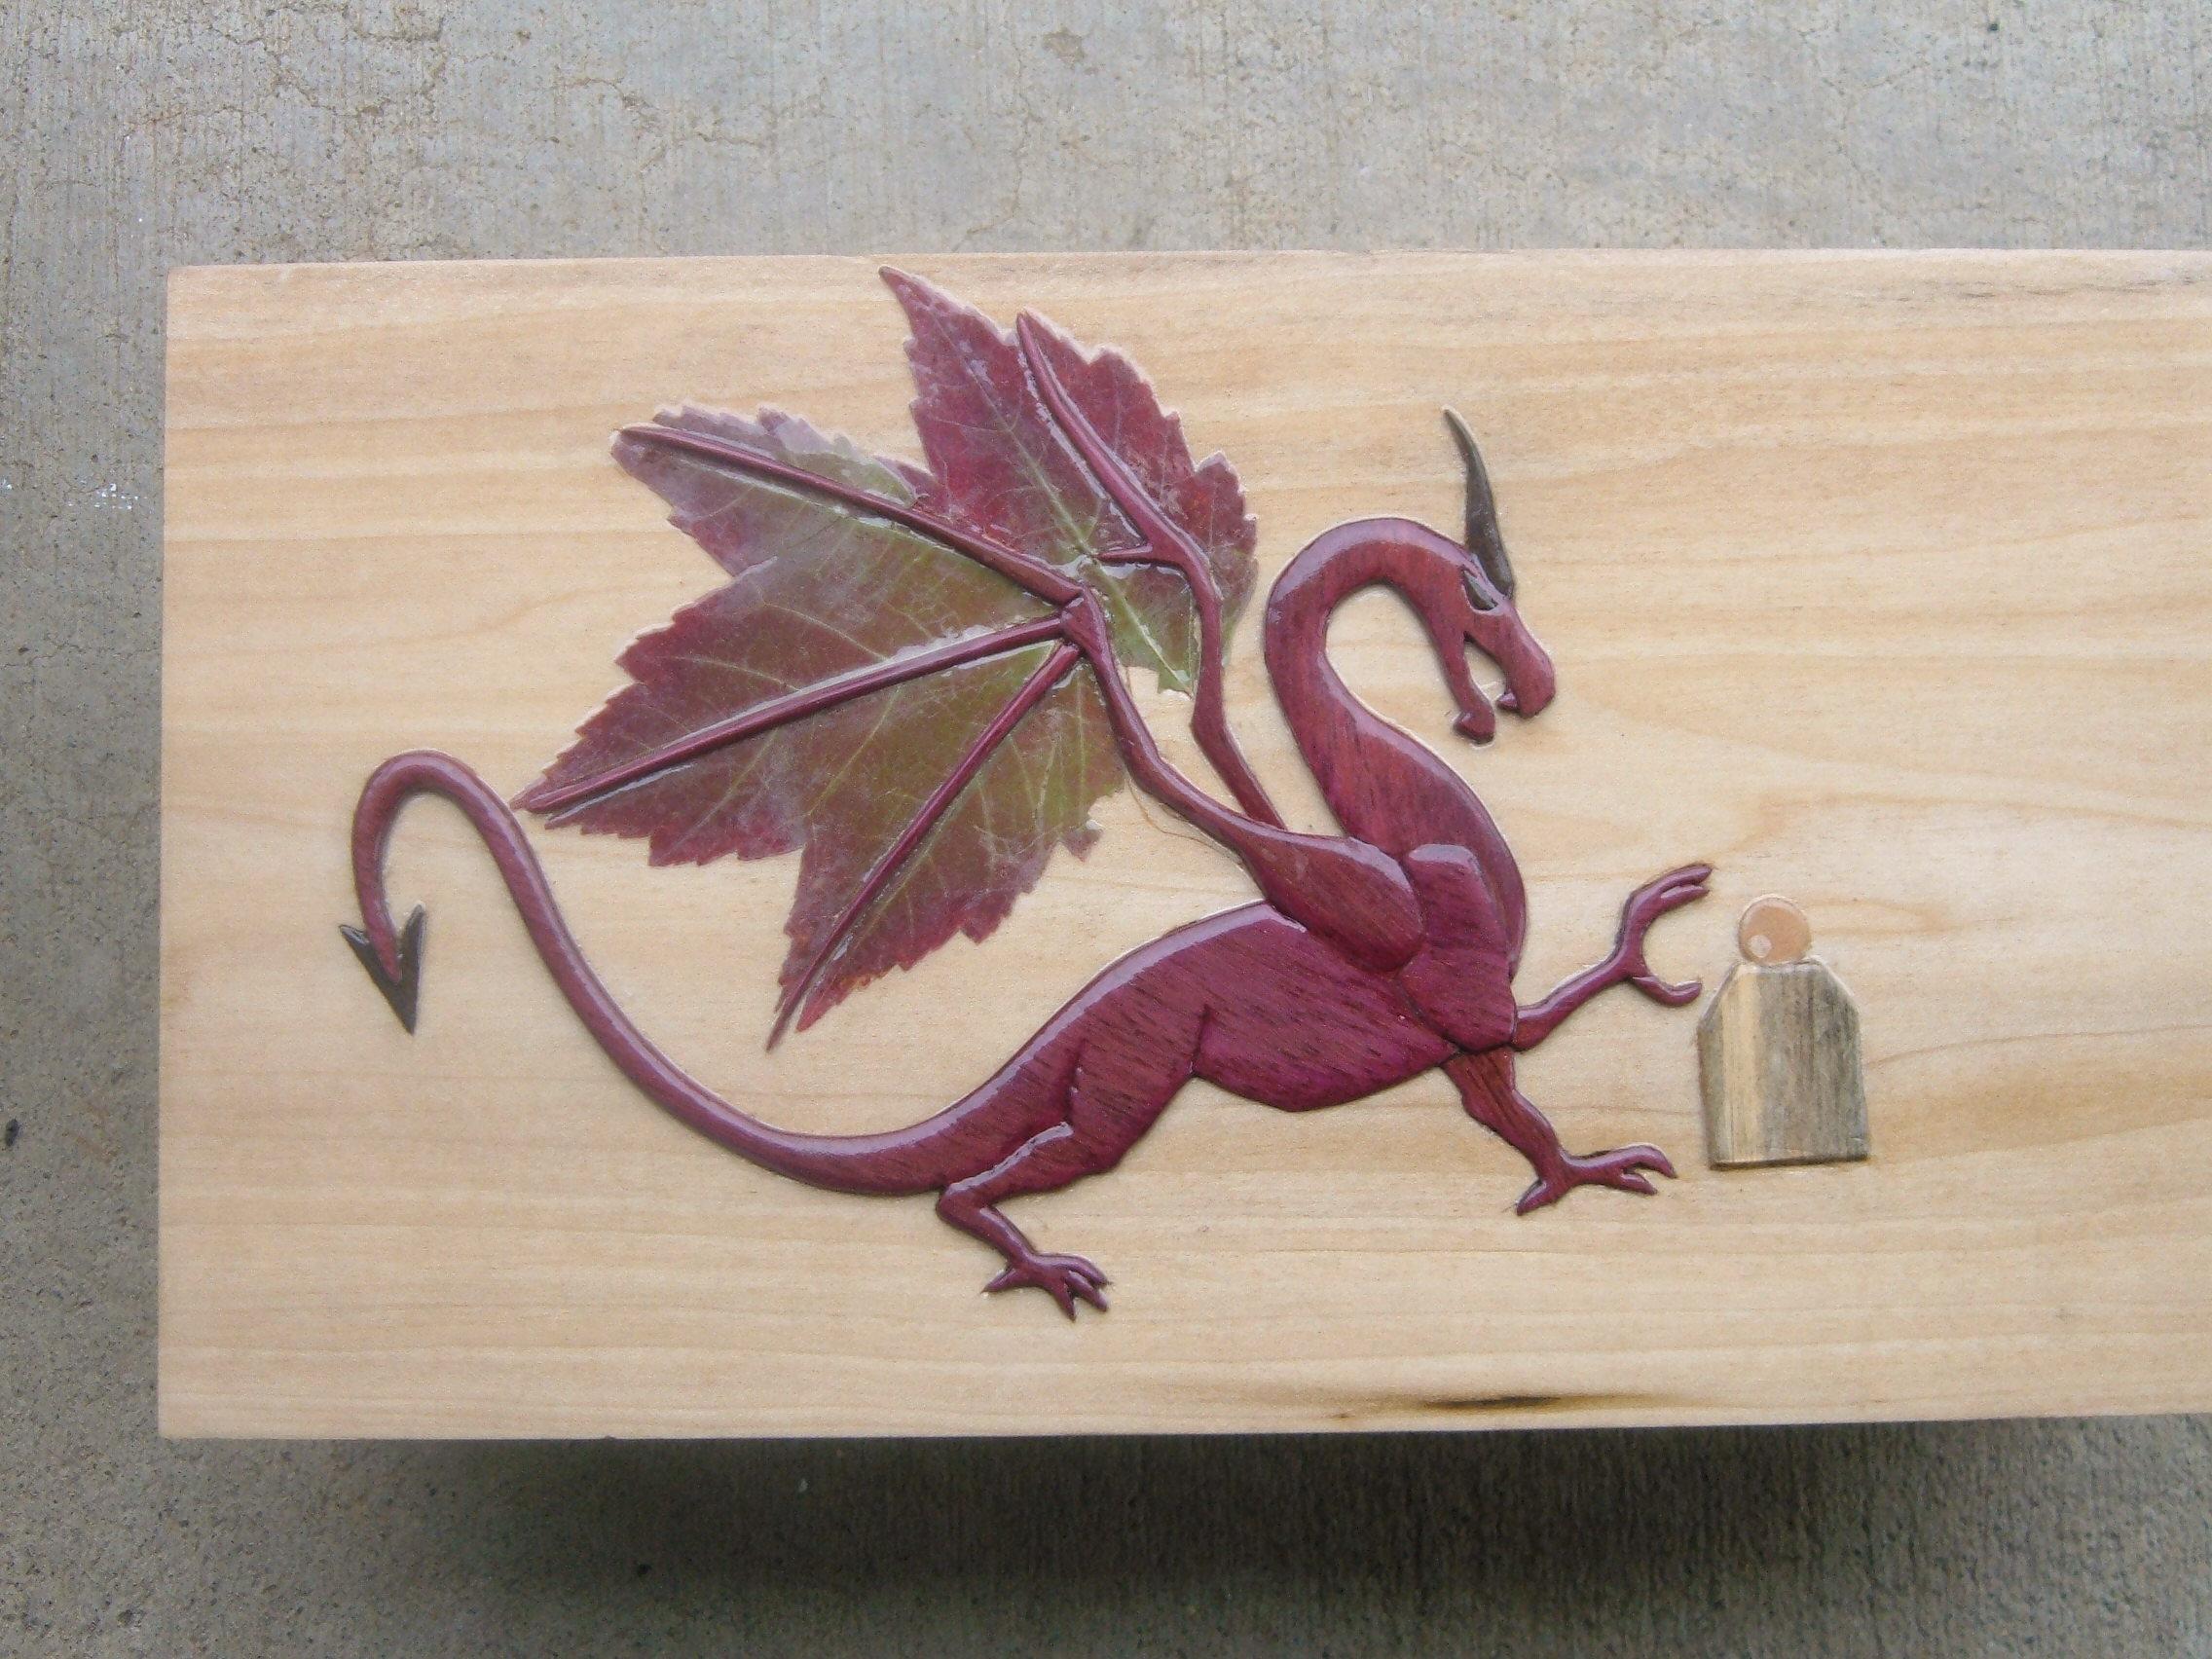 Purpleheart | The Wood Database - Lumber Identification (Hardwoods)